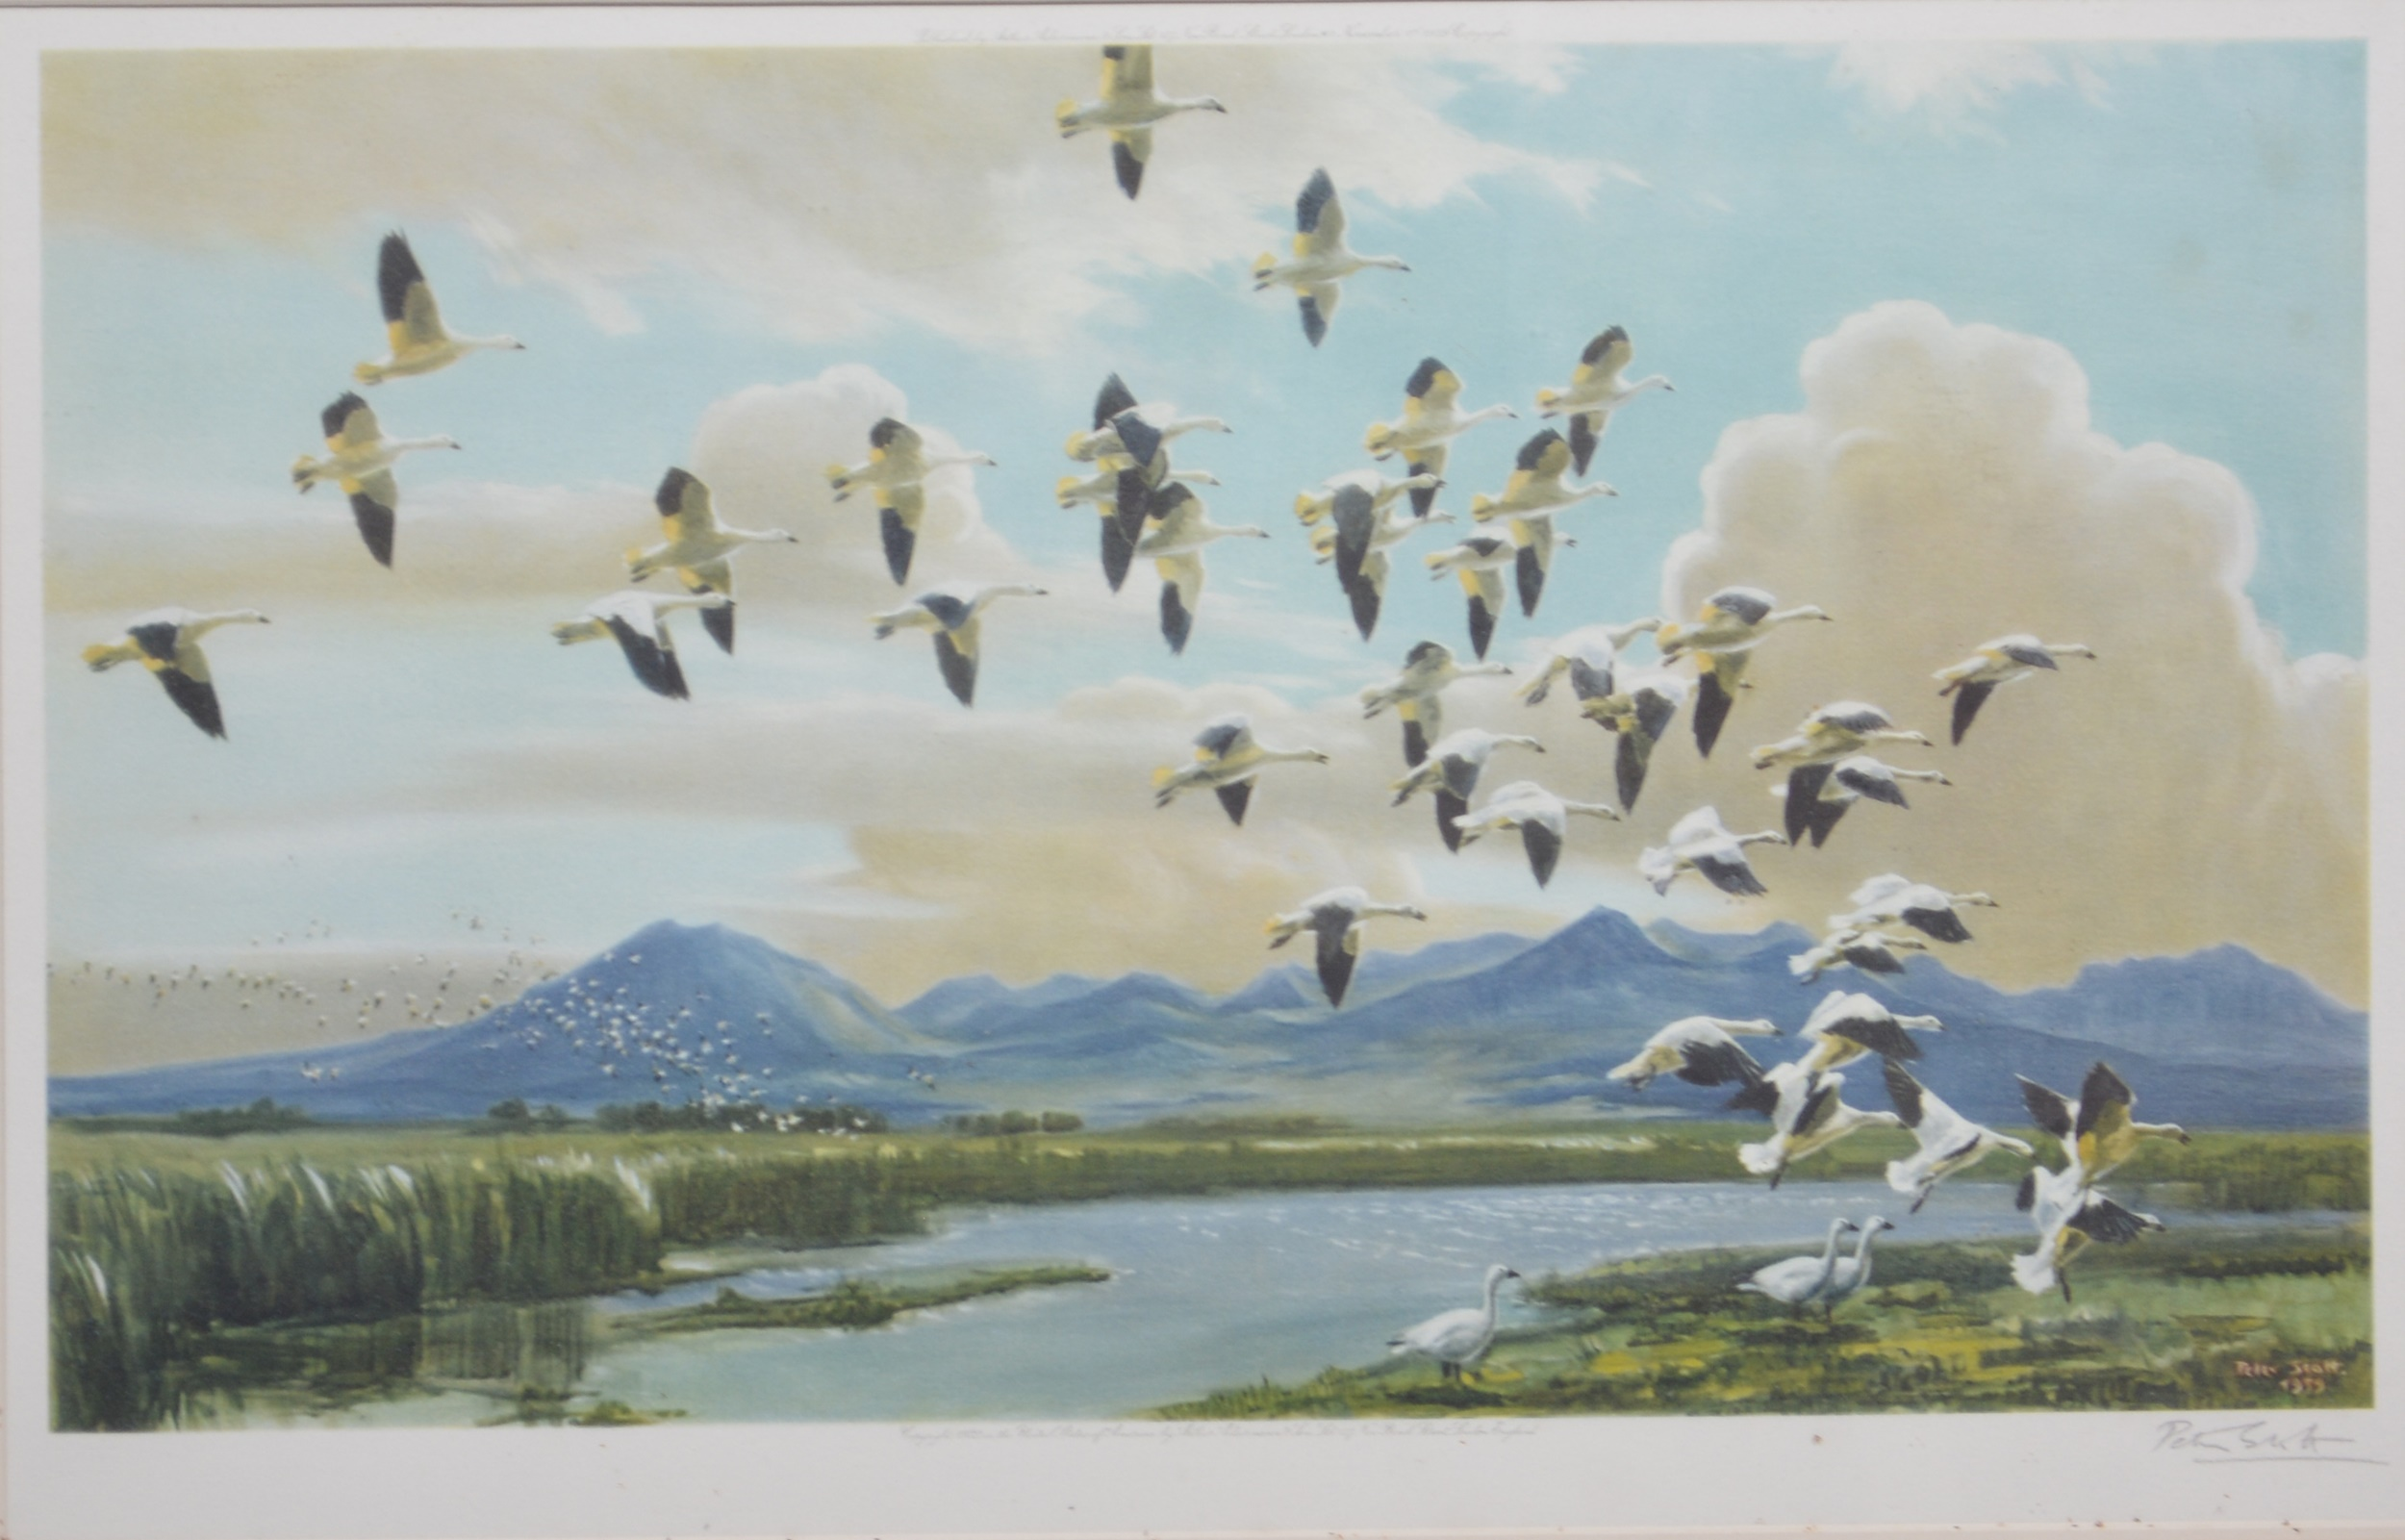 Peter Scott, Snow geese in California,